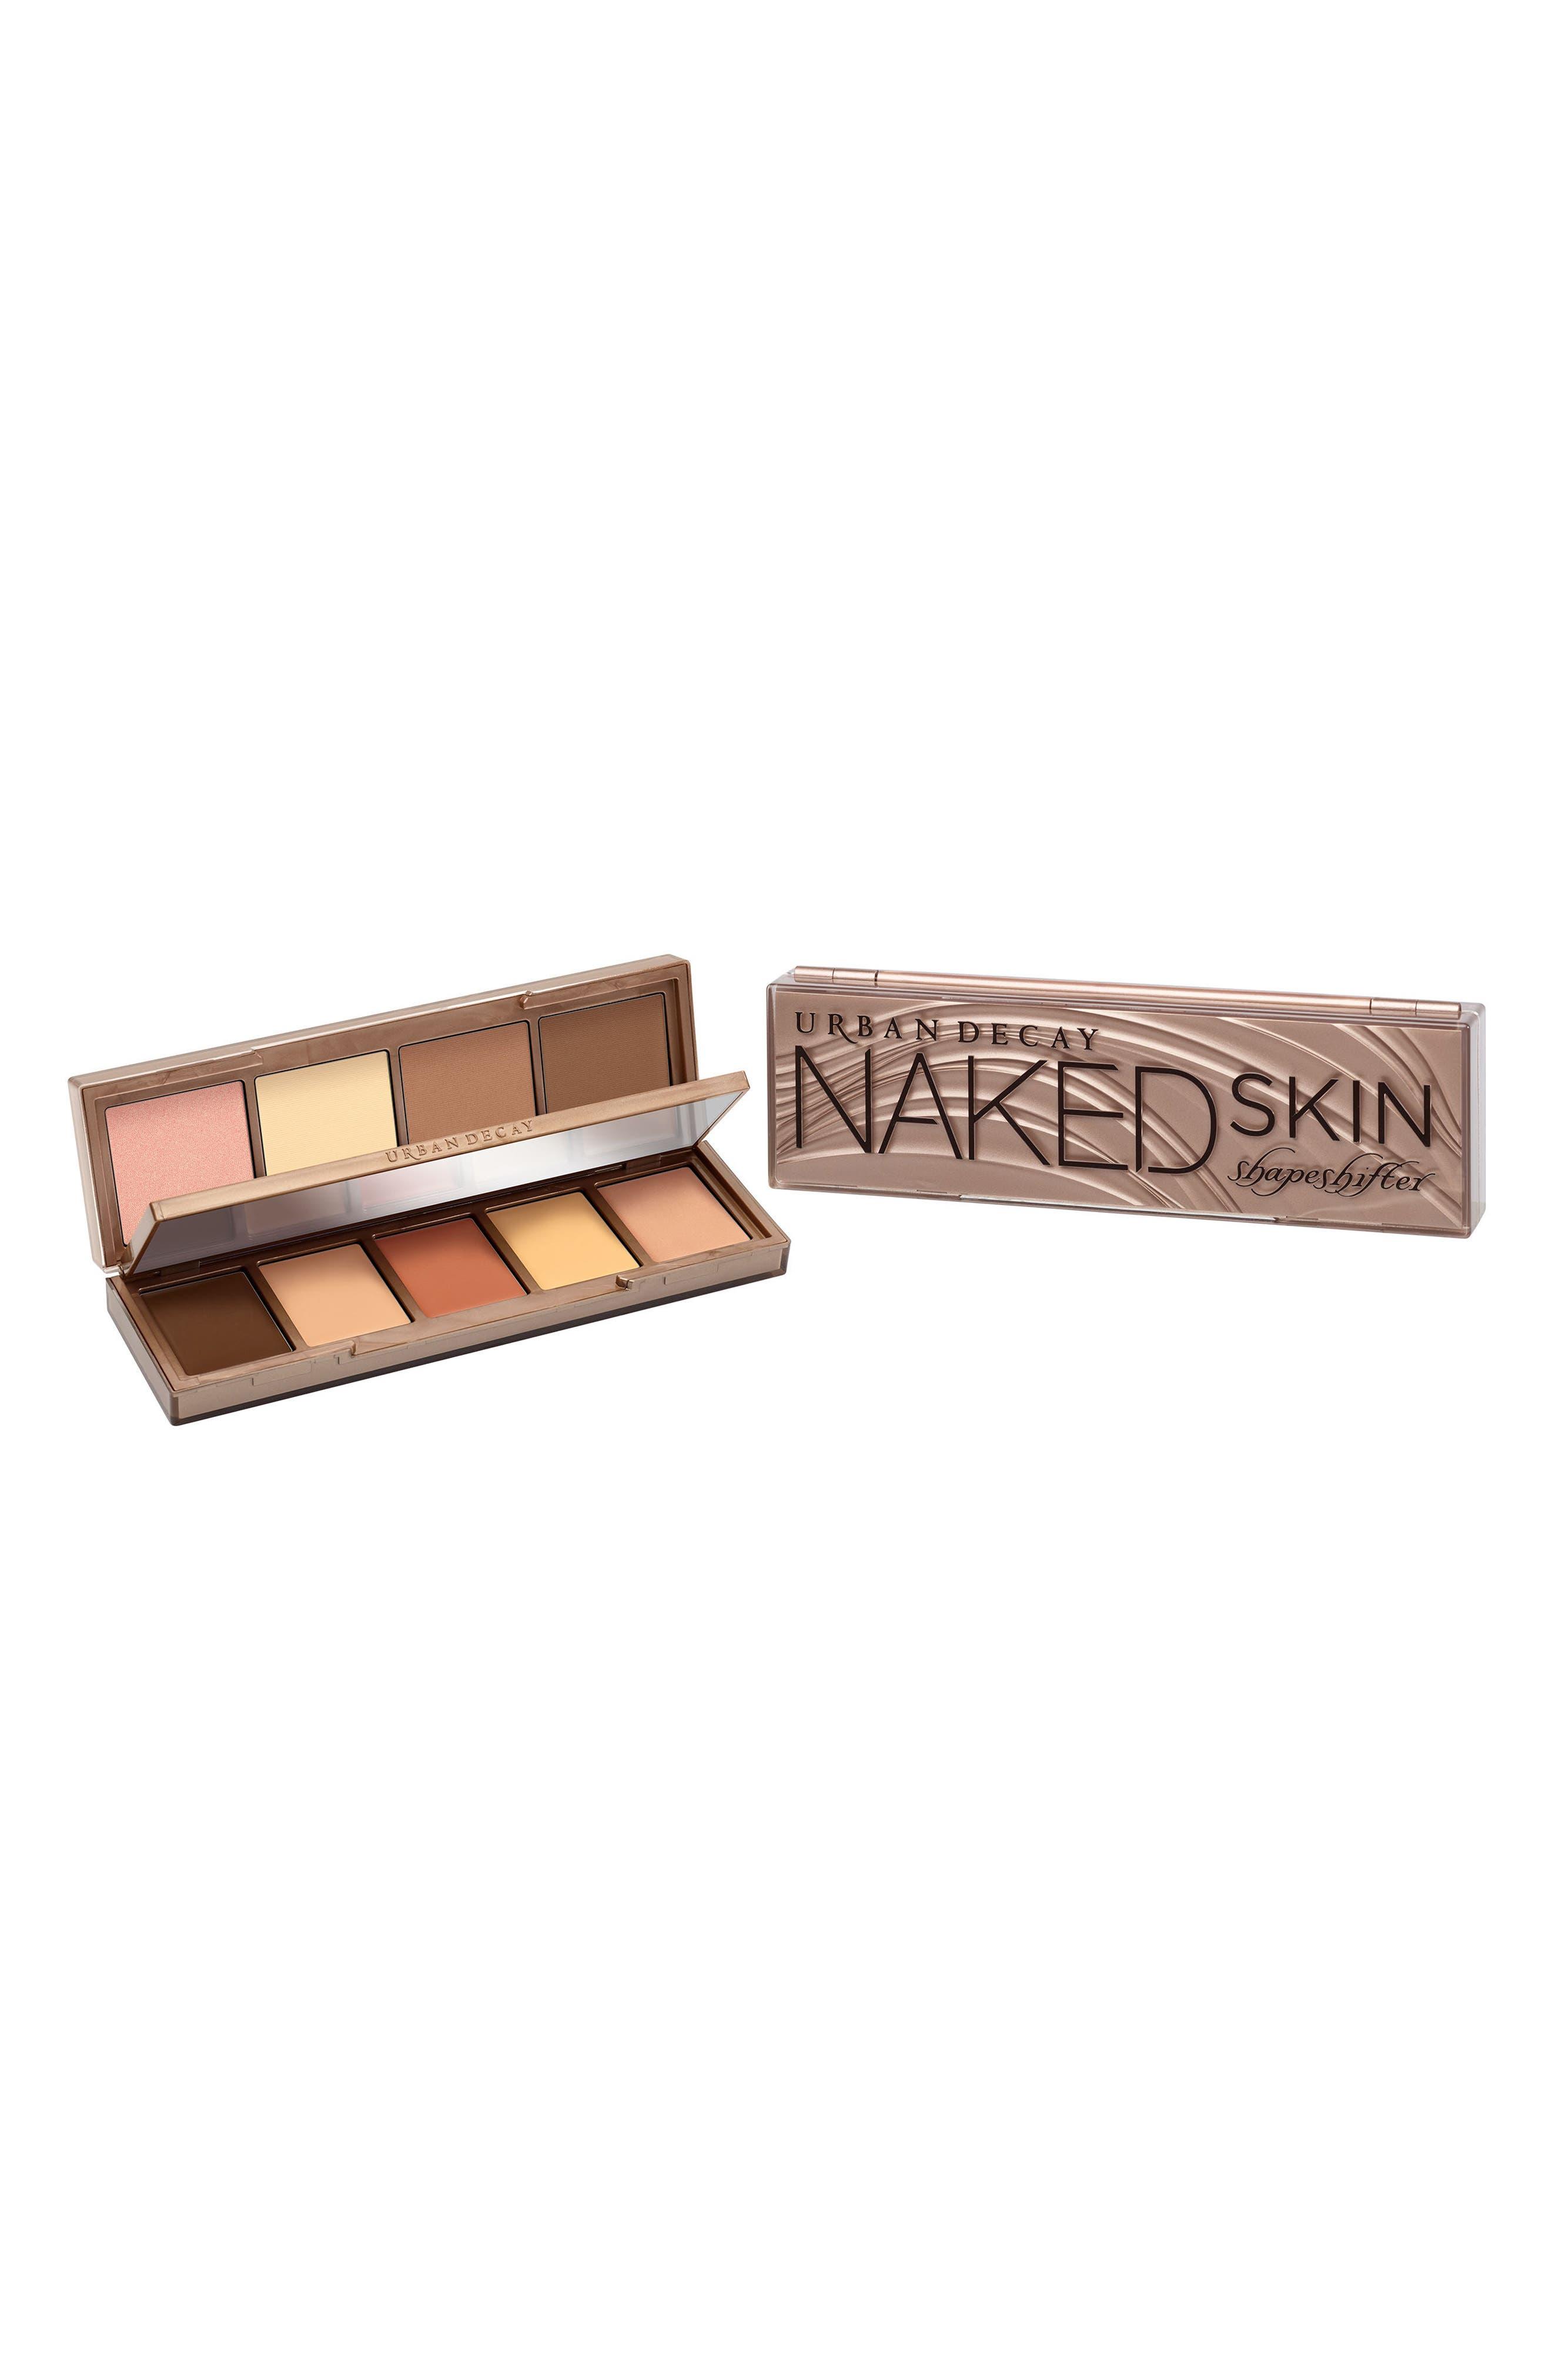 Urban Decay Naked Skin Shapeshifter Palette